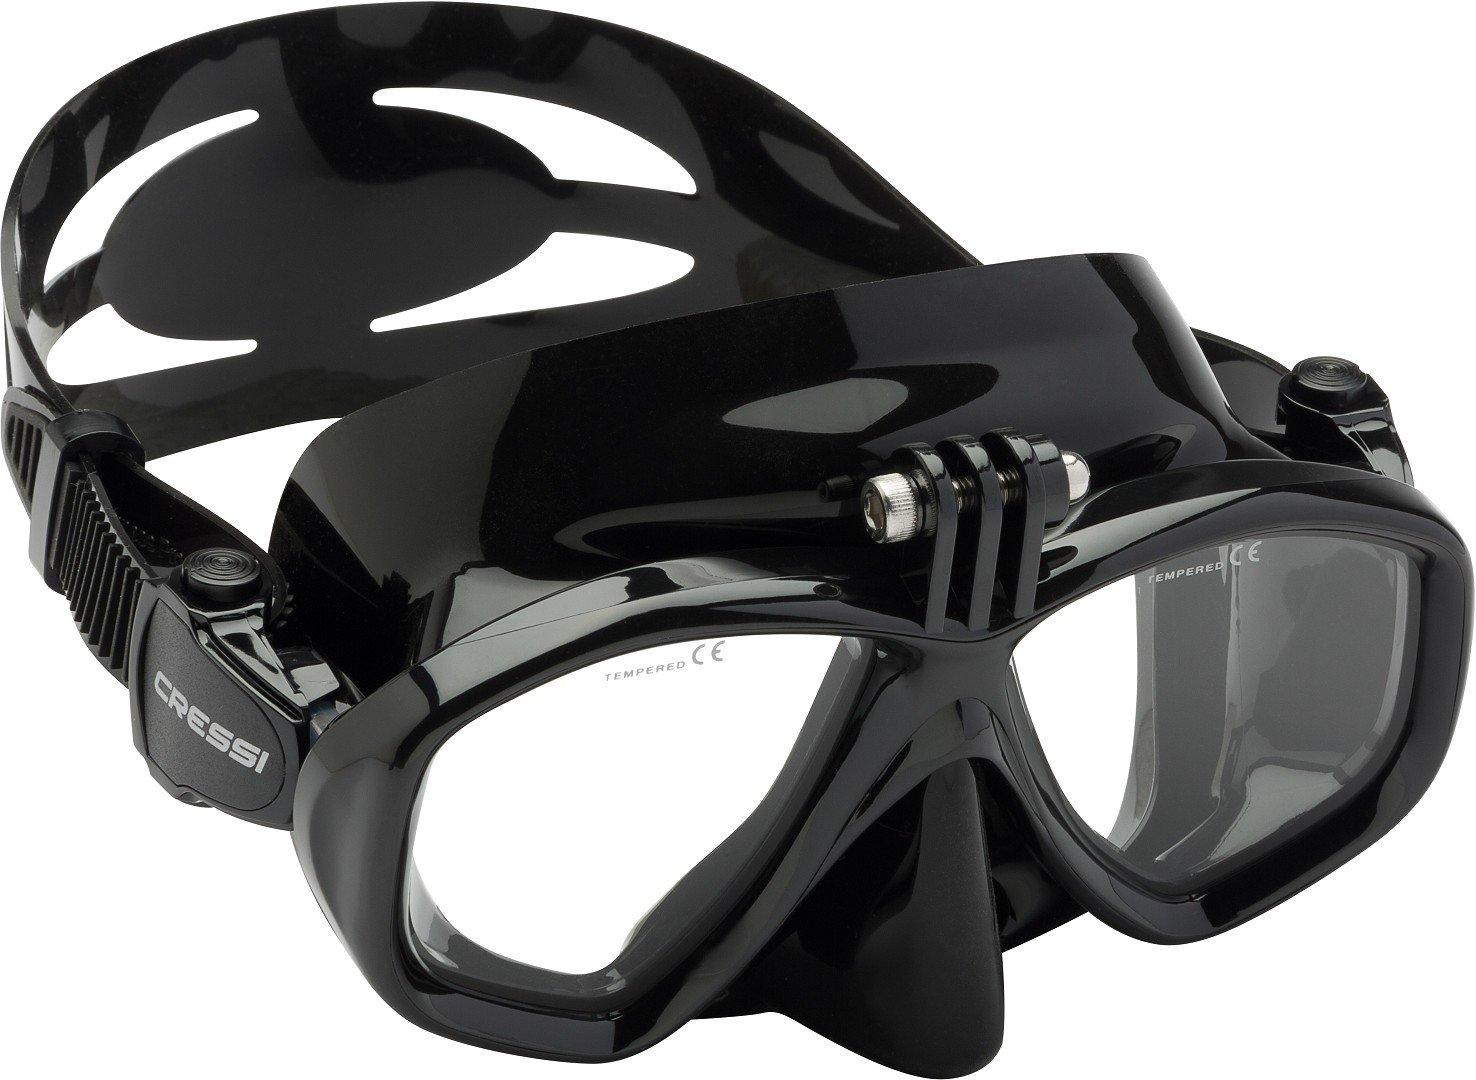 Cressi Action Mask (with GoPro Mount) - Black